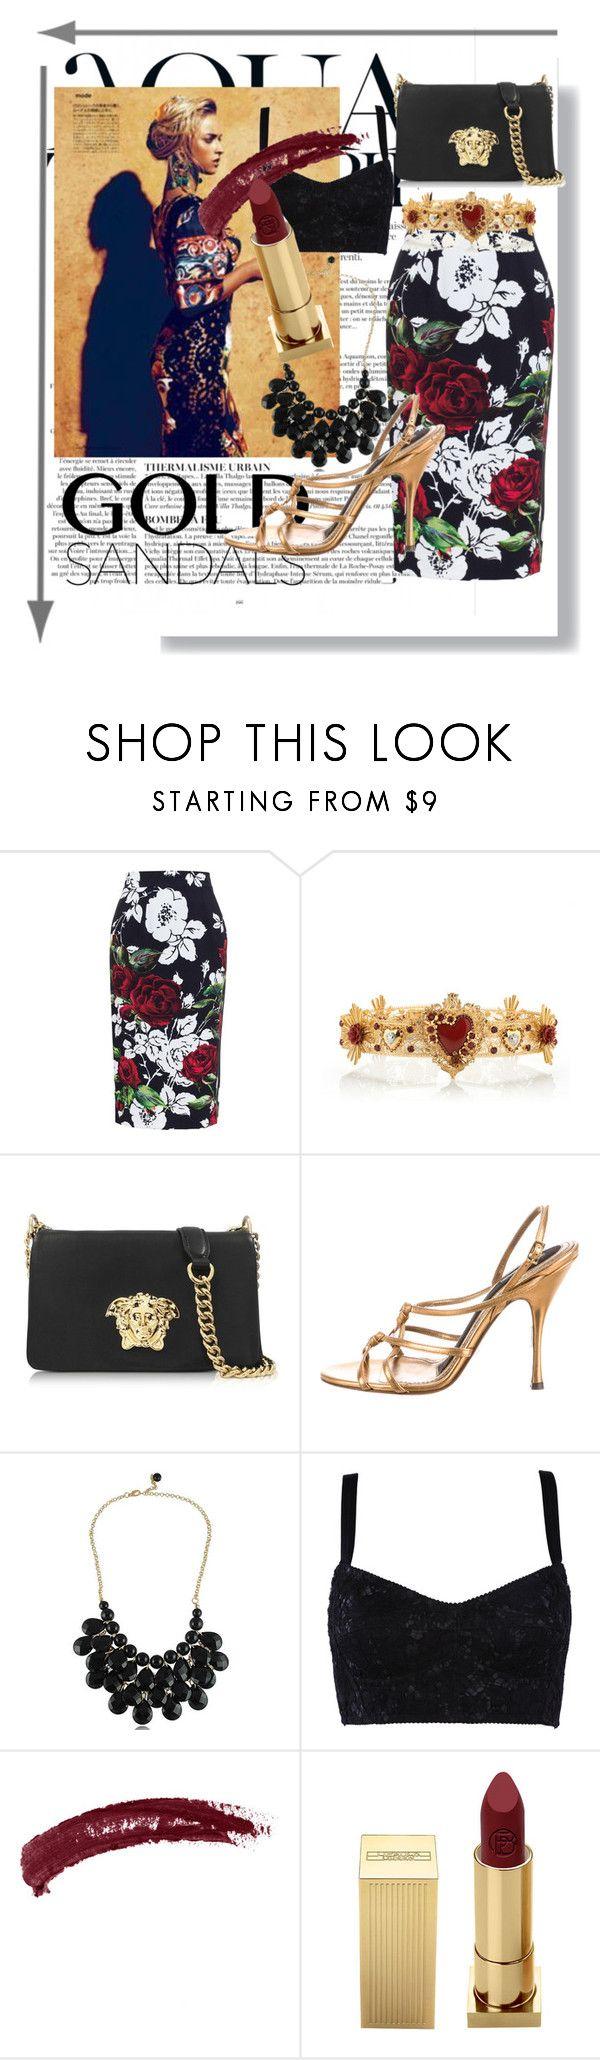 Golden Age by hacii on Polyvore featuring moda, Dolce&Gabbana, Versace, Lipstick Queen, Topshop, Anja, dolceandgabbana, goldsandals and beoriginal